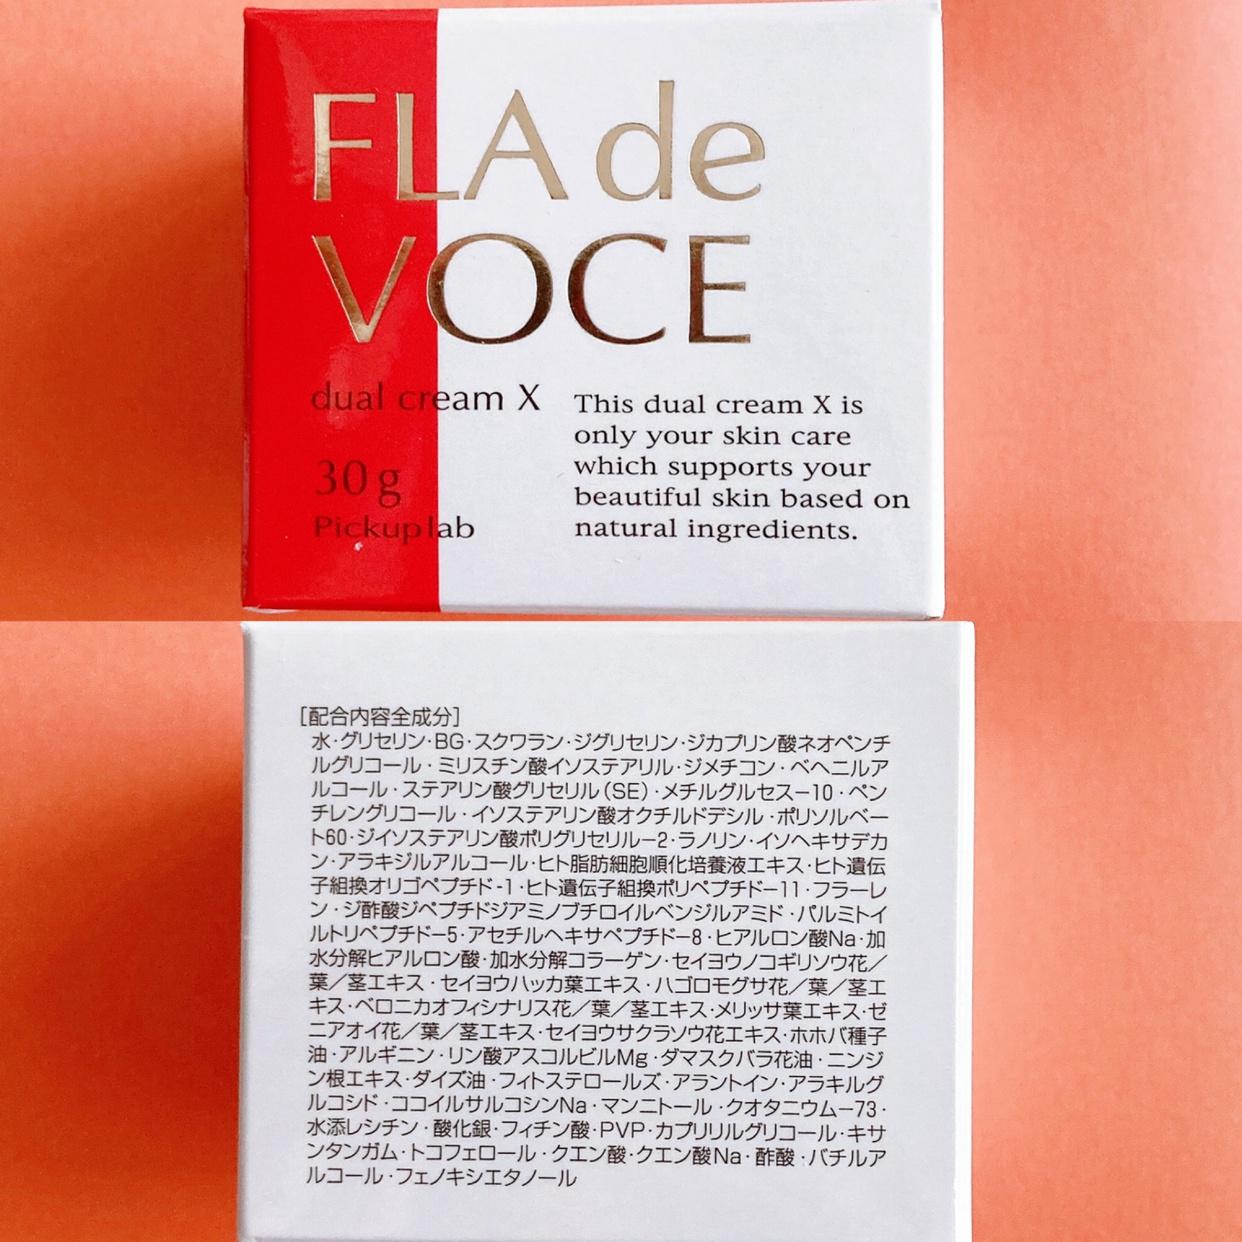 FLAdeVOCE(フラデヴォーチェ) デュアルクリームⅩを使ったyunaさんのクチコミ画像2